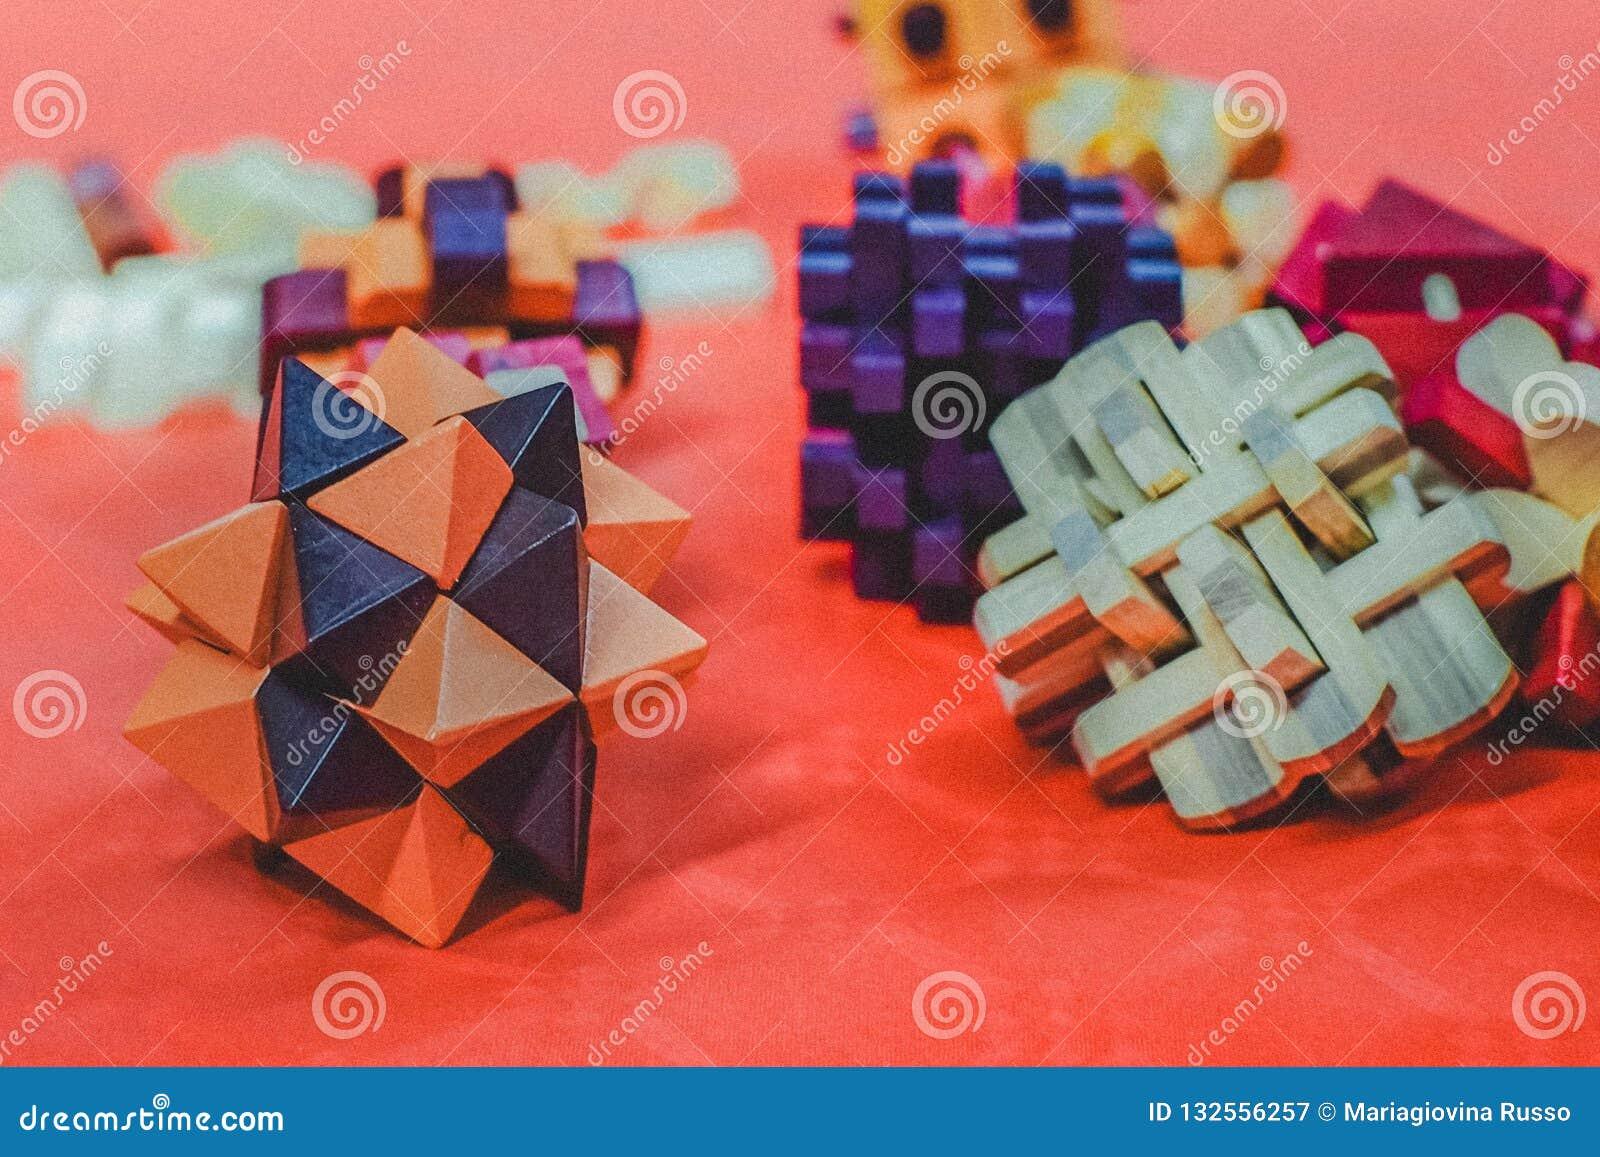 Arranjo de bloco colorido de formas e de cores diferentes